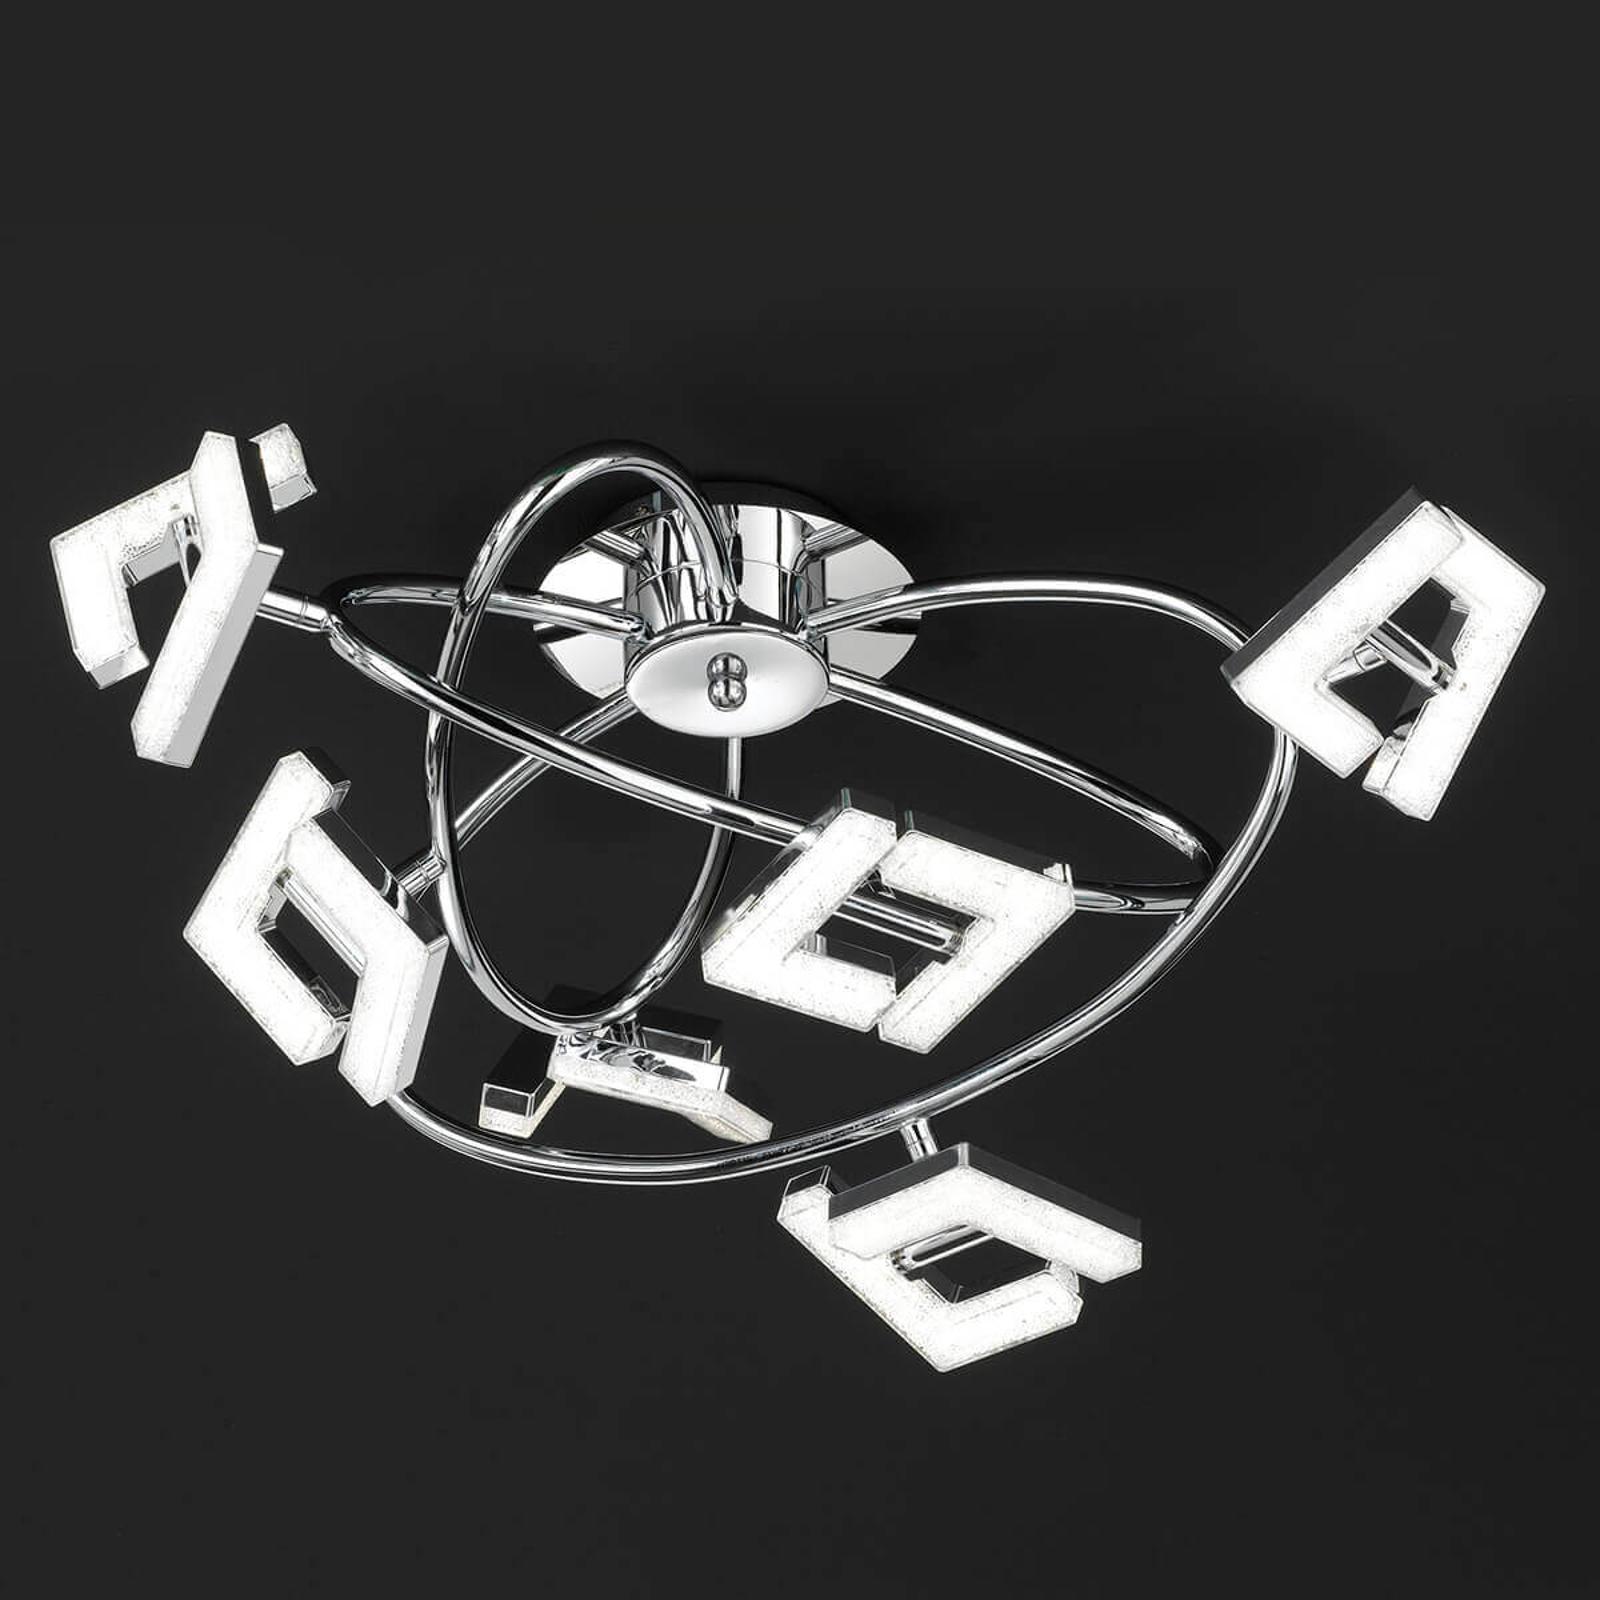 Toppmodern LED-taklampa Lea - 6 lampor